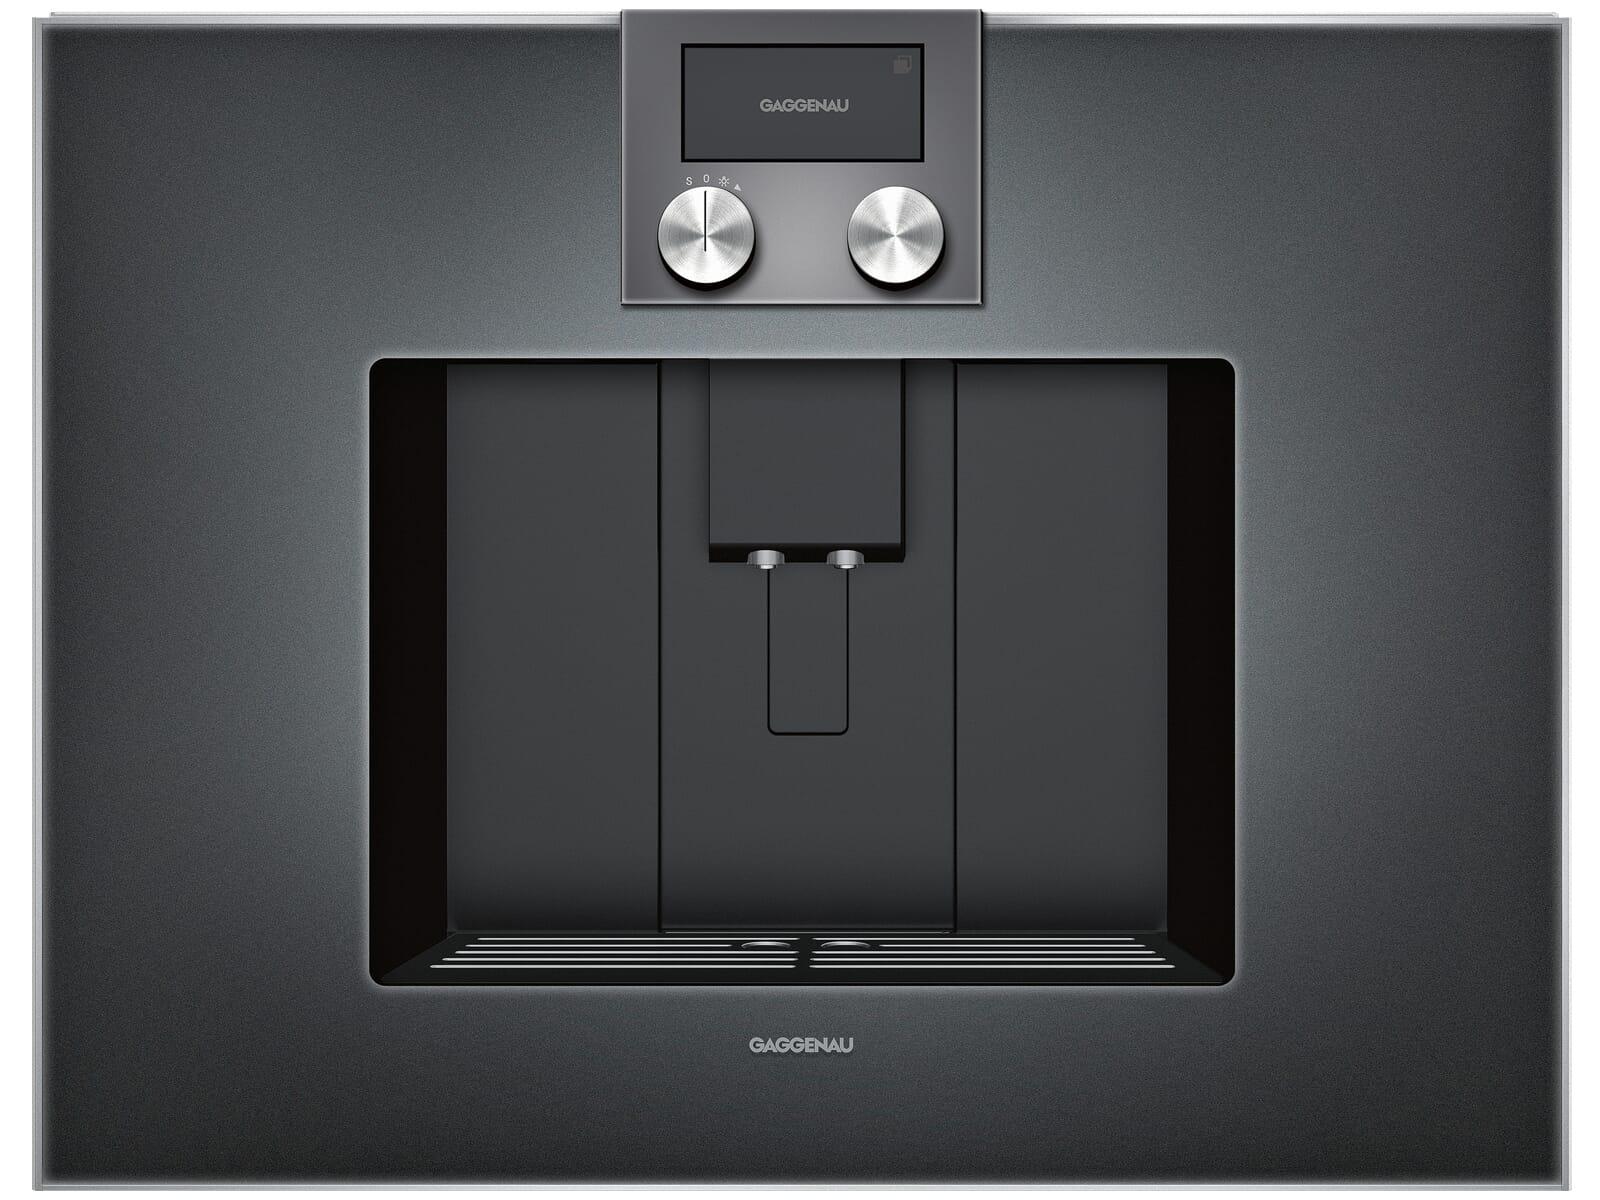 Gaggenau CM 450 101 Einbau-Espressovollautomat Serie 400 Anthrazit